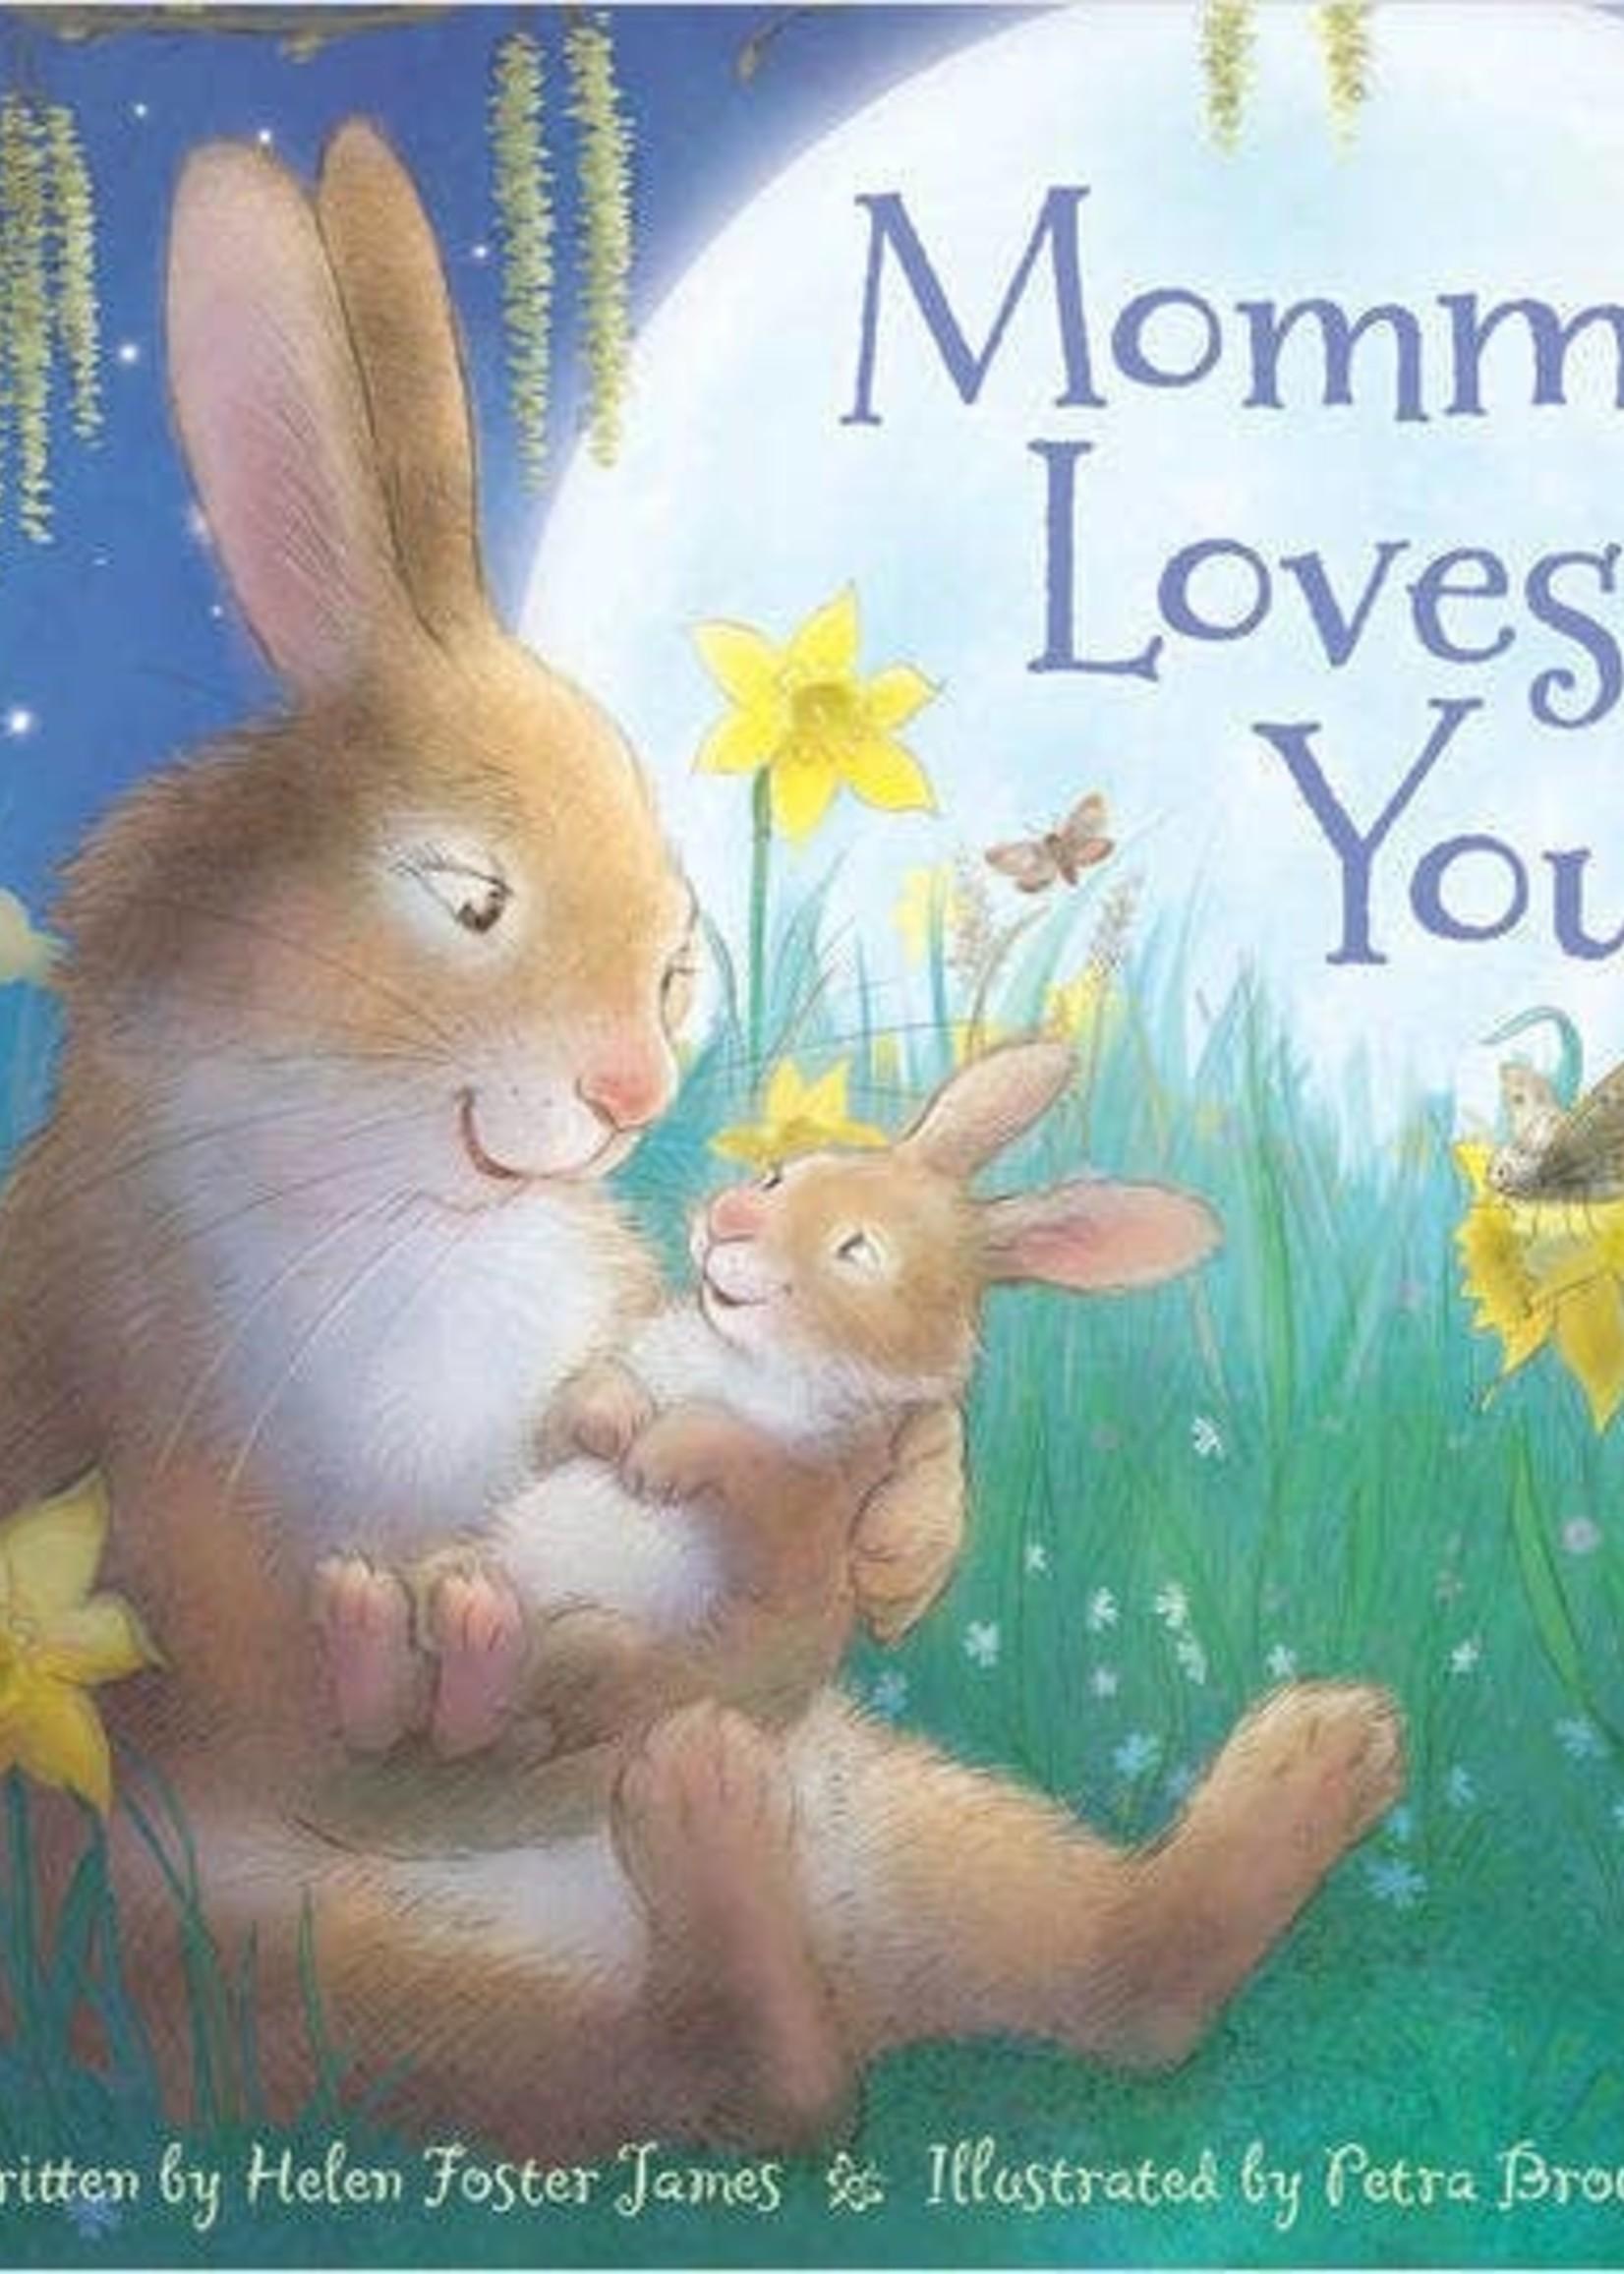 Sleeping bear press Mommy loves you